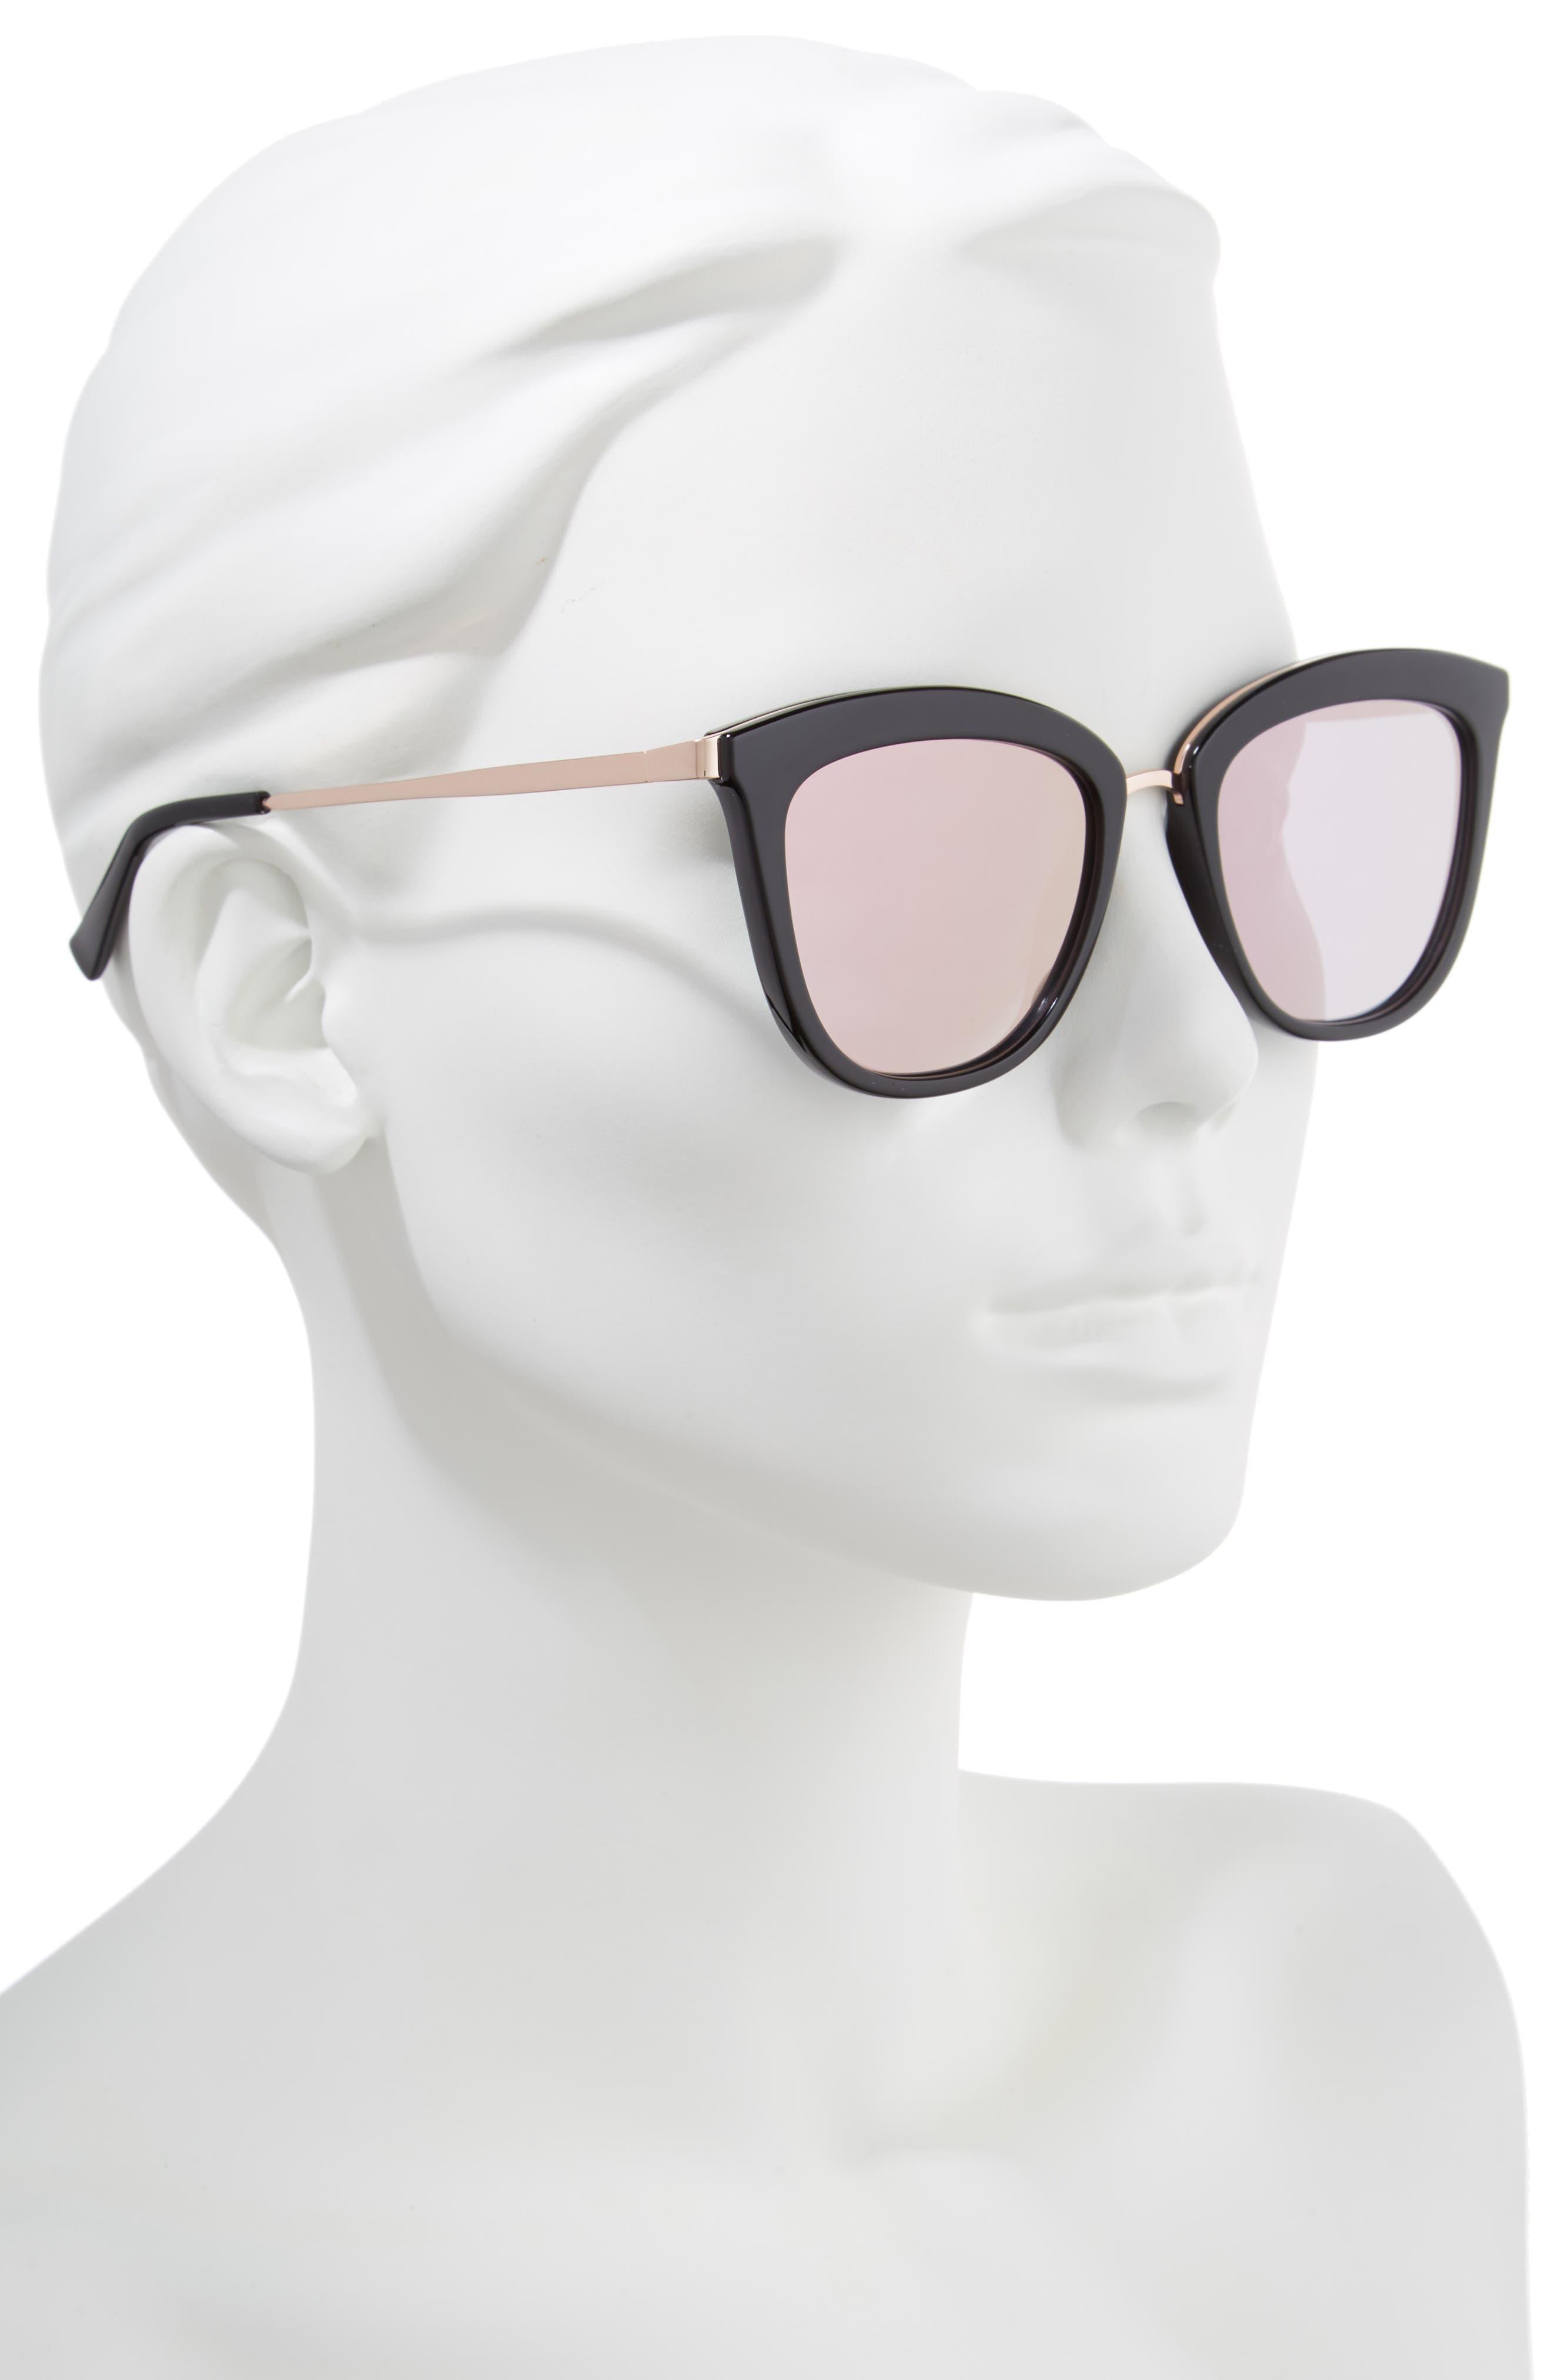 Caliente 53mm Cat Eye Sunglasses,                             Alternate thumbnail 2, color,                             Black/ Rose Gold